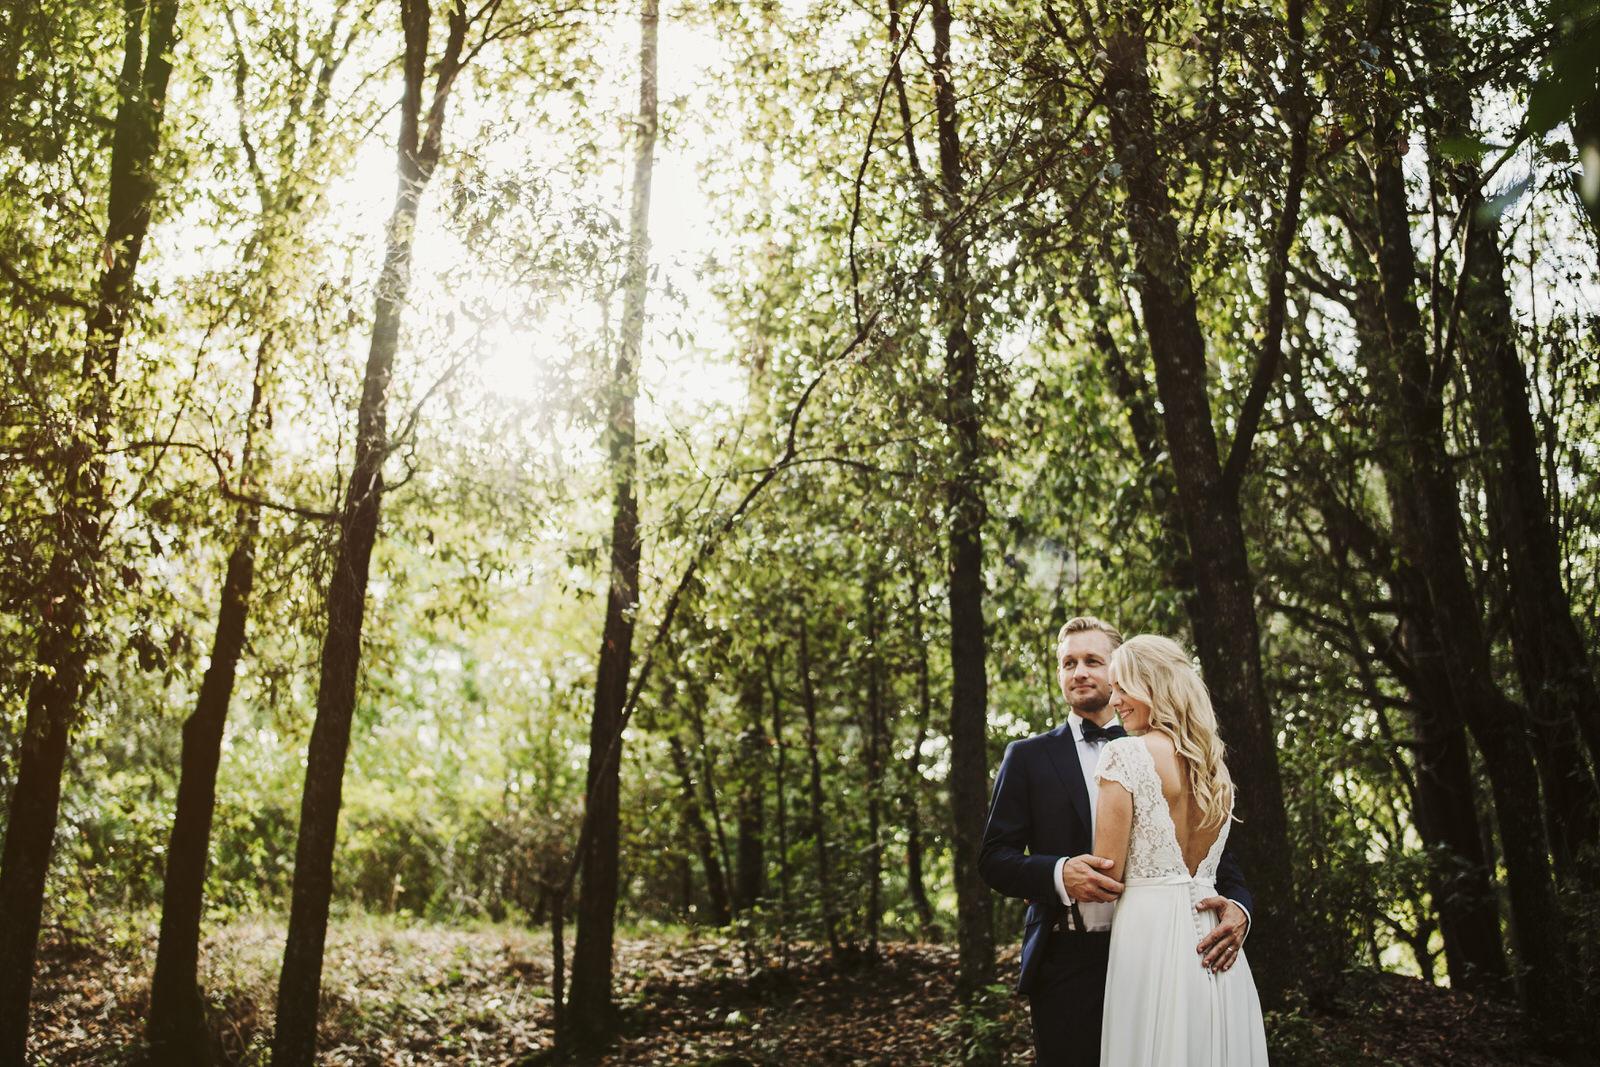 wedding photographer in italy-venice-tuscany-florence-amalfi coast-como lake-villa del balbianello-siena-amalfi-ravello-belmond-villa cimbrone71